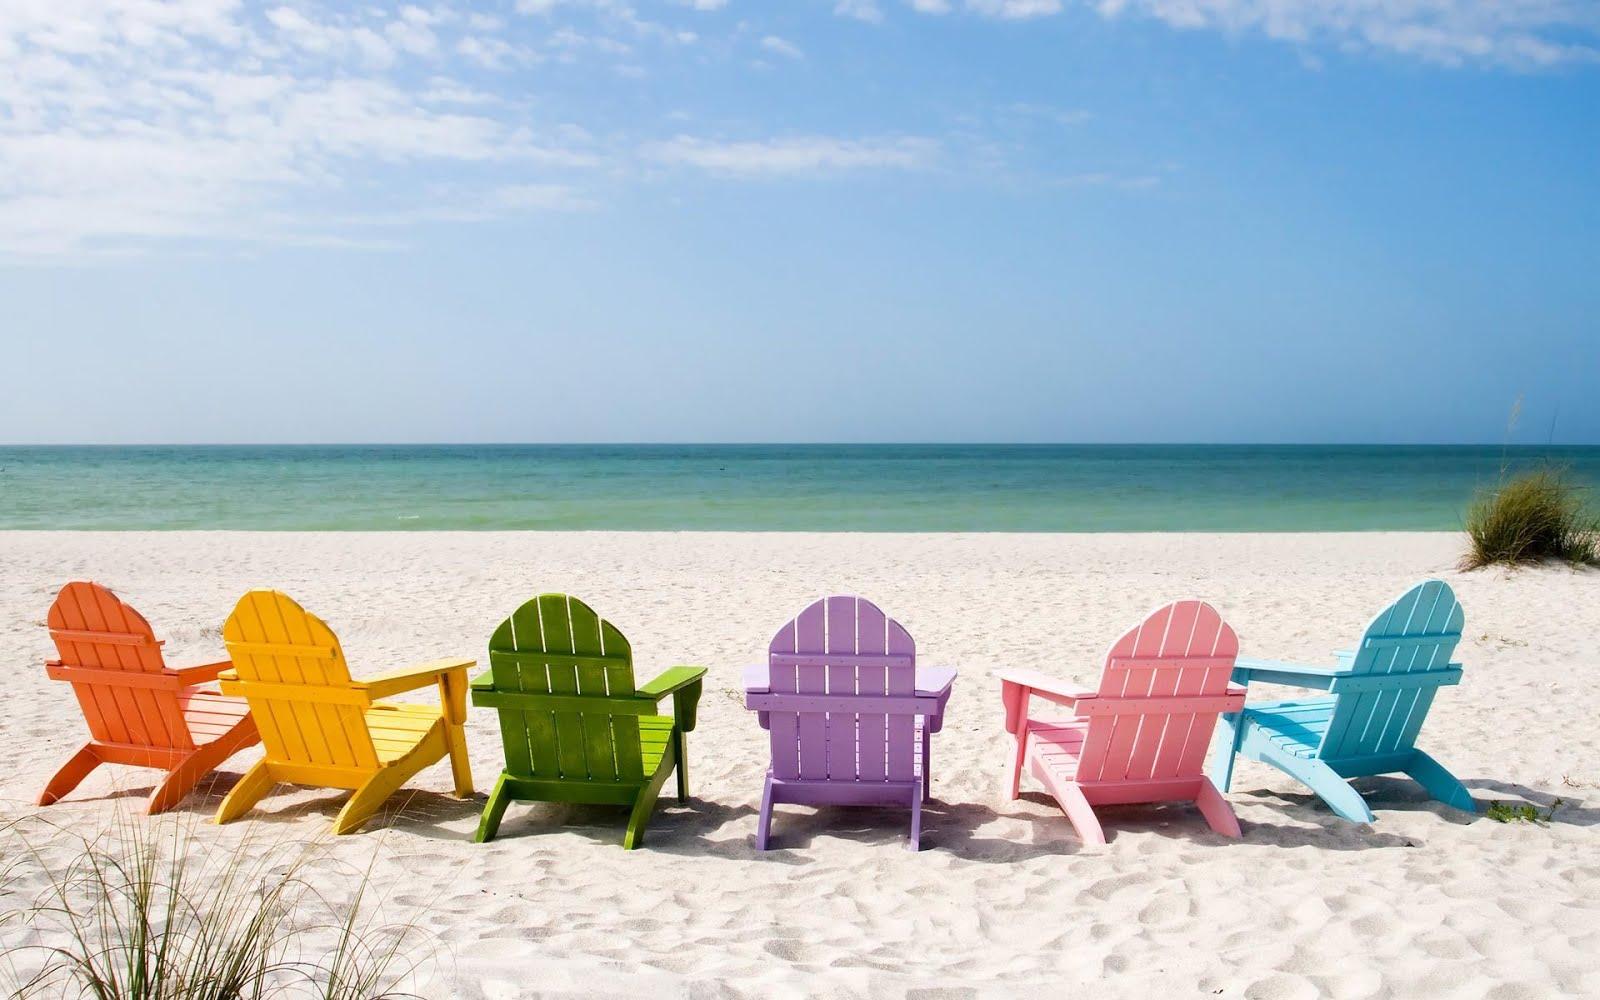 Beach Adjustable Backrest - sand-chairs-beach%2B%25282%2529_Wonderful Beach Adjustable Backrest - sand-chairs-beach%2B%25282%2529  Gallery_969221.jpg